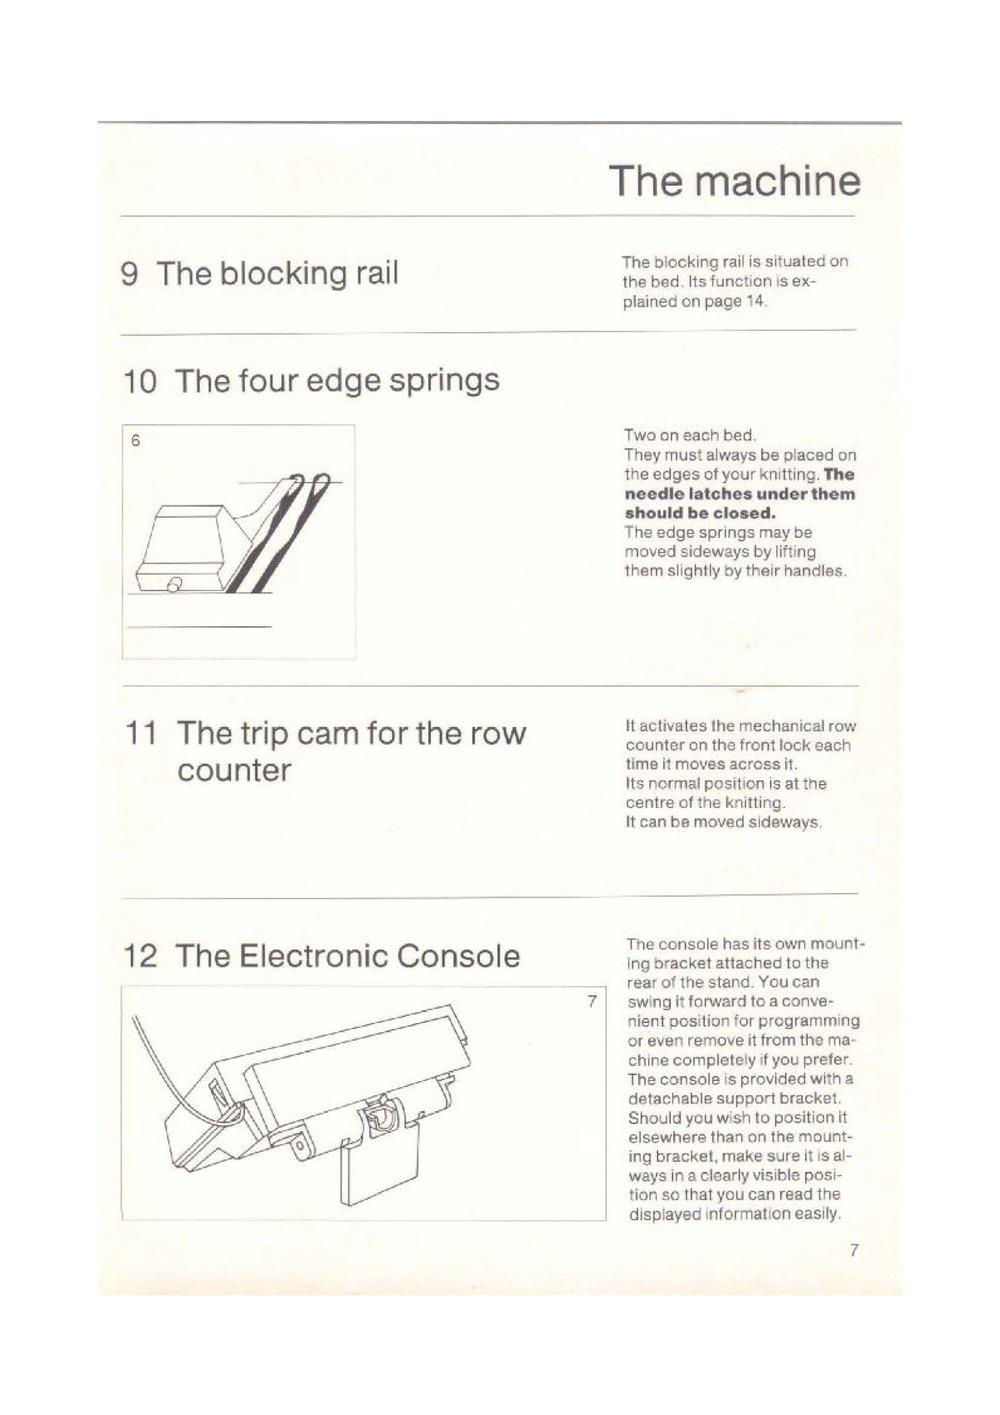 passap_e6000_instruction_manual (100)_Page_008.jpg